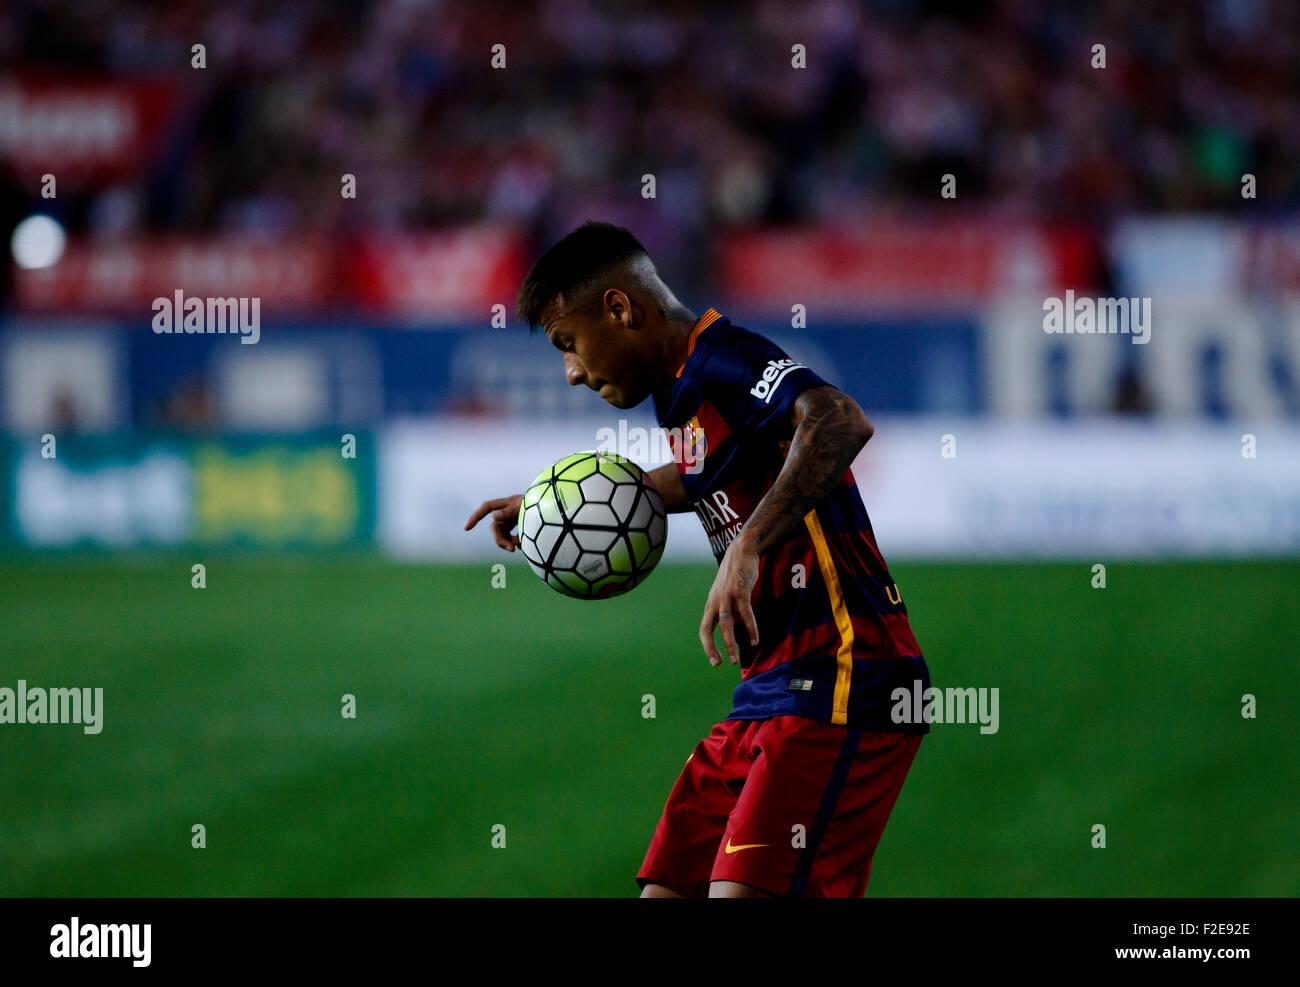 SPAIN, Madrid:FC Barcelona's Brazilian forward Neymar da Silva during the Spanish League 2015/16 - Stock Image